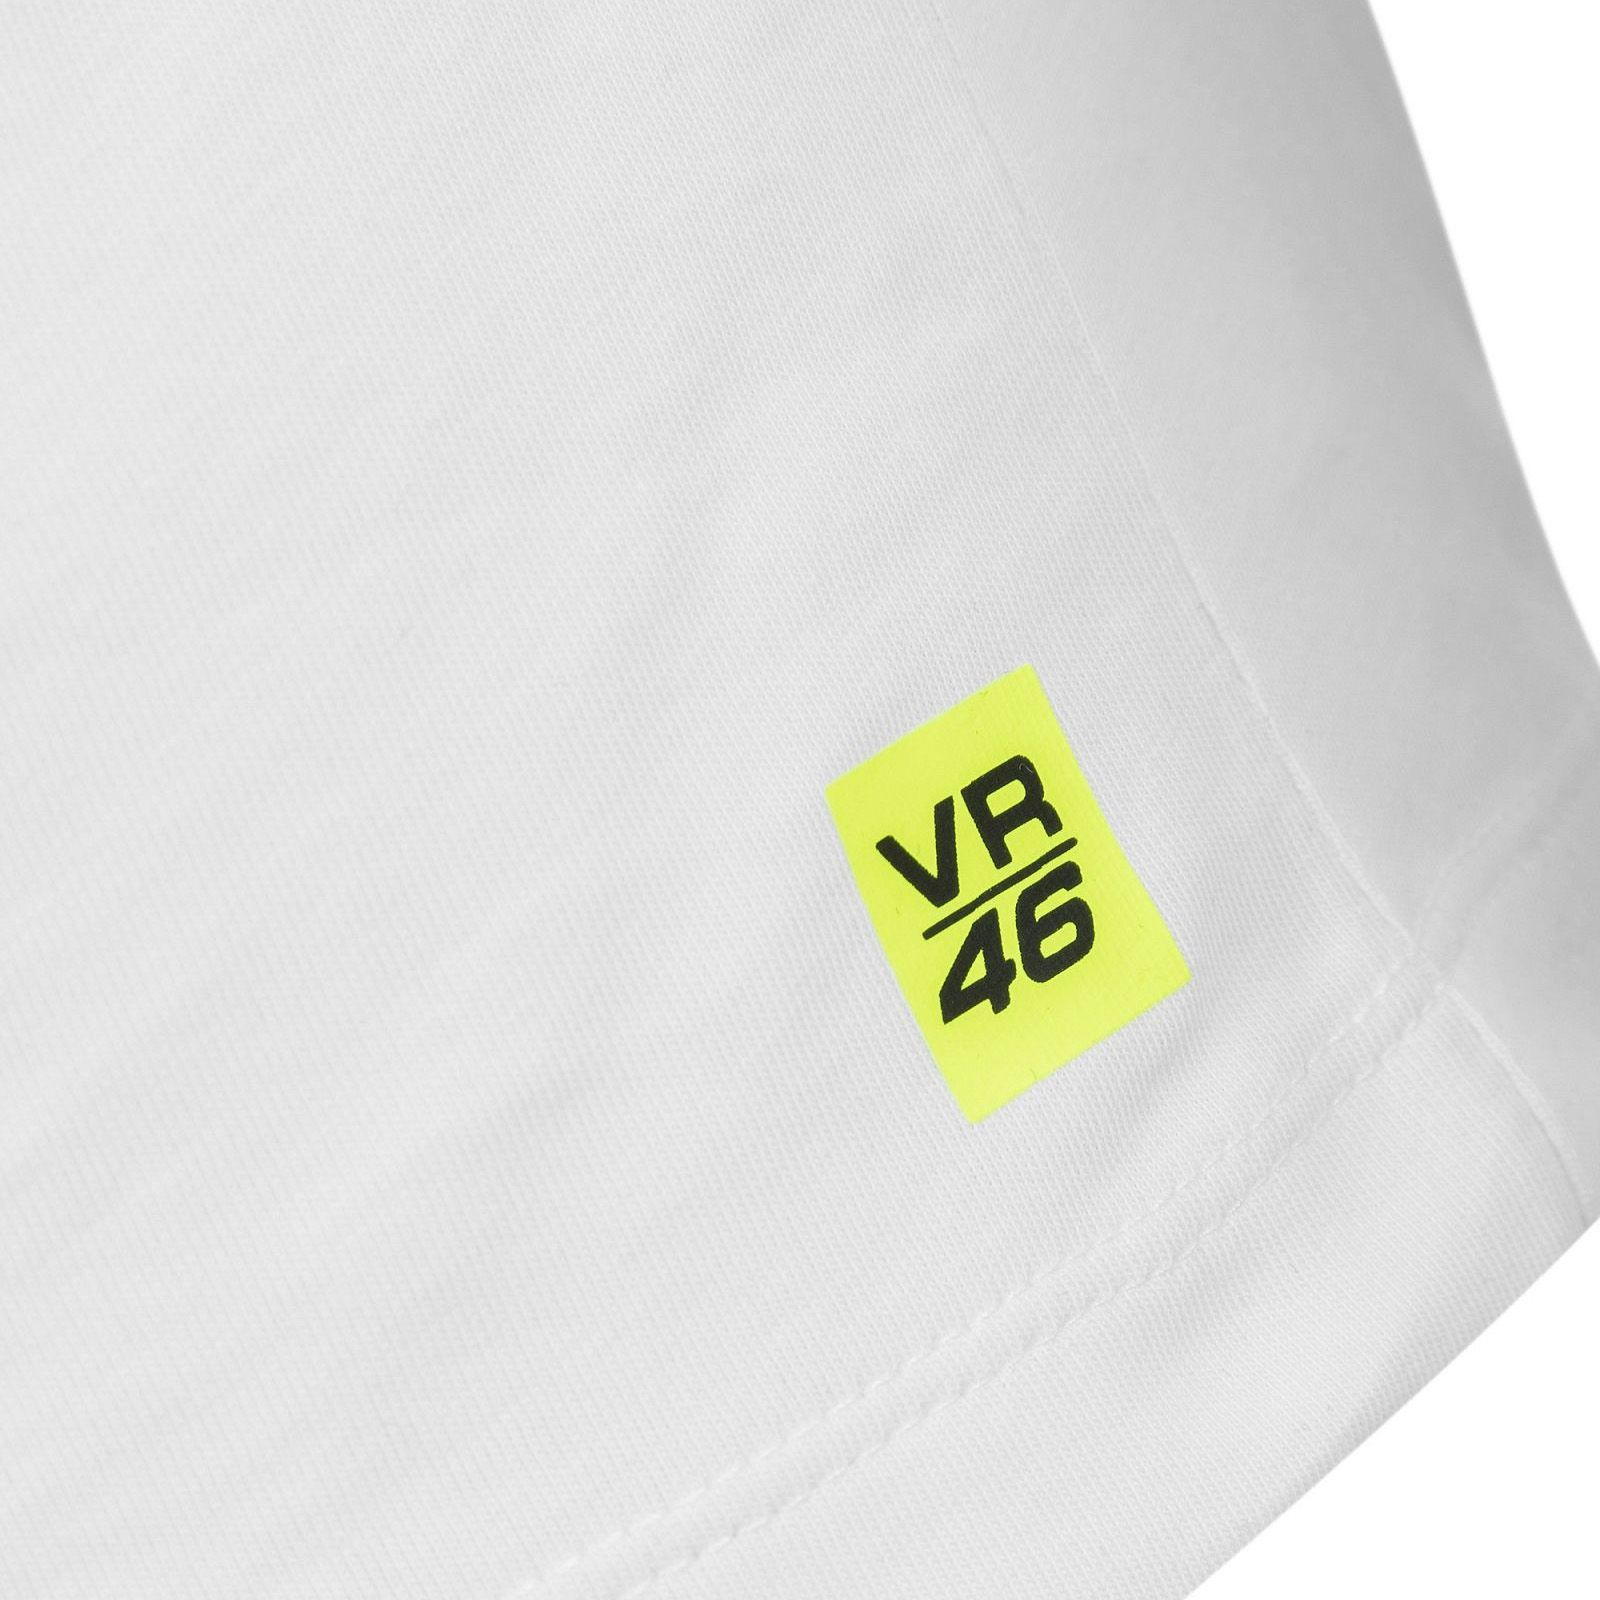 edd42632432f Official VR46 Core Collection Valentino Rossi Small 46 Mens T-Shirt - White